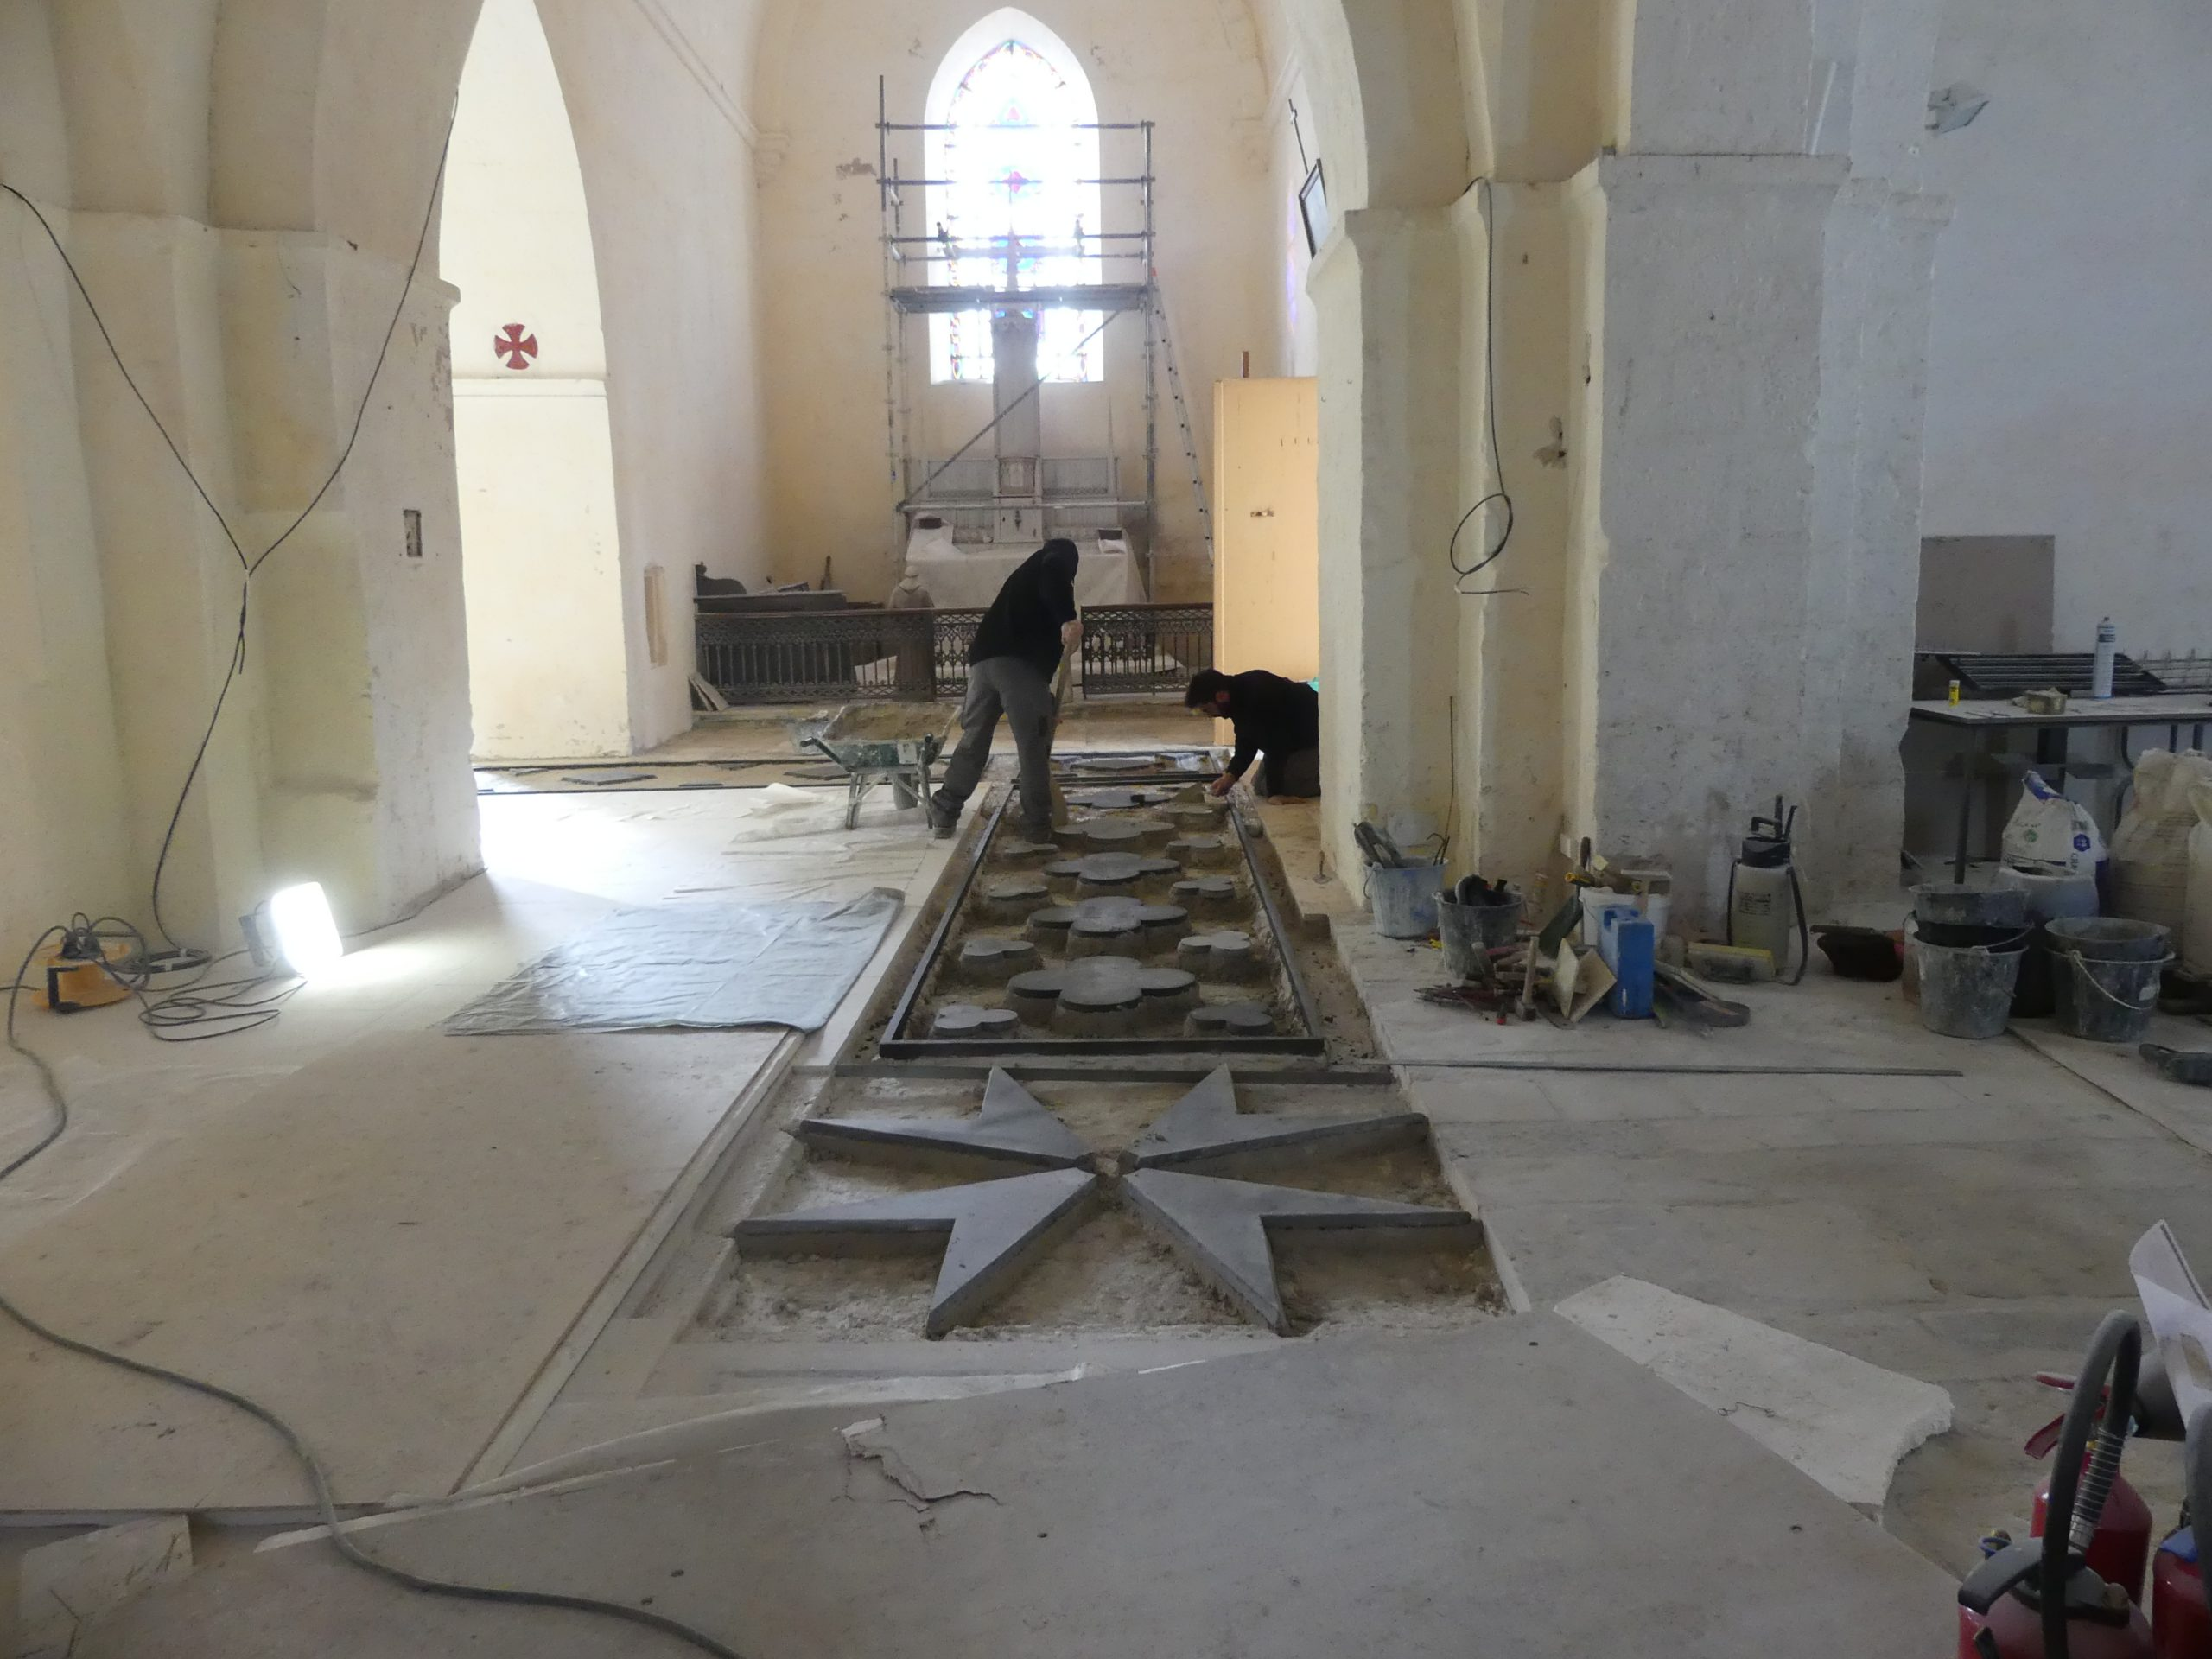 Ars - Eglise - Sol - Croix de Malte - 22 novembre 2019